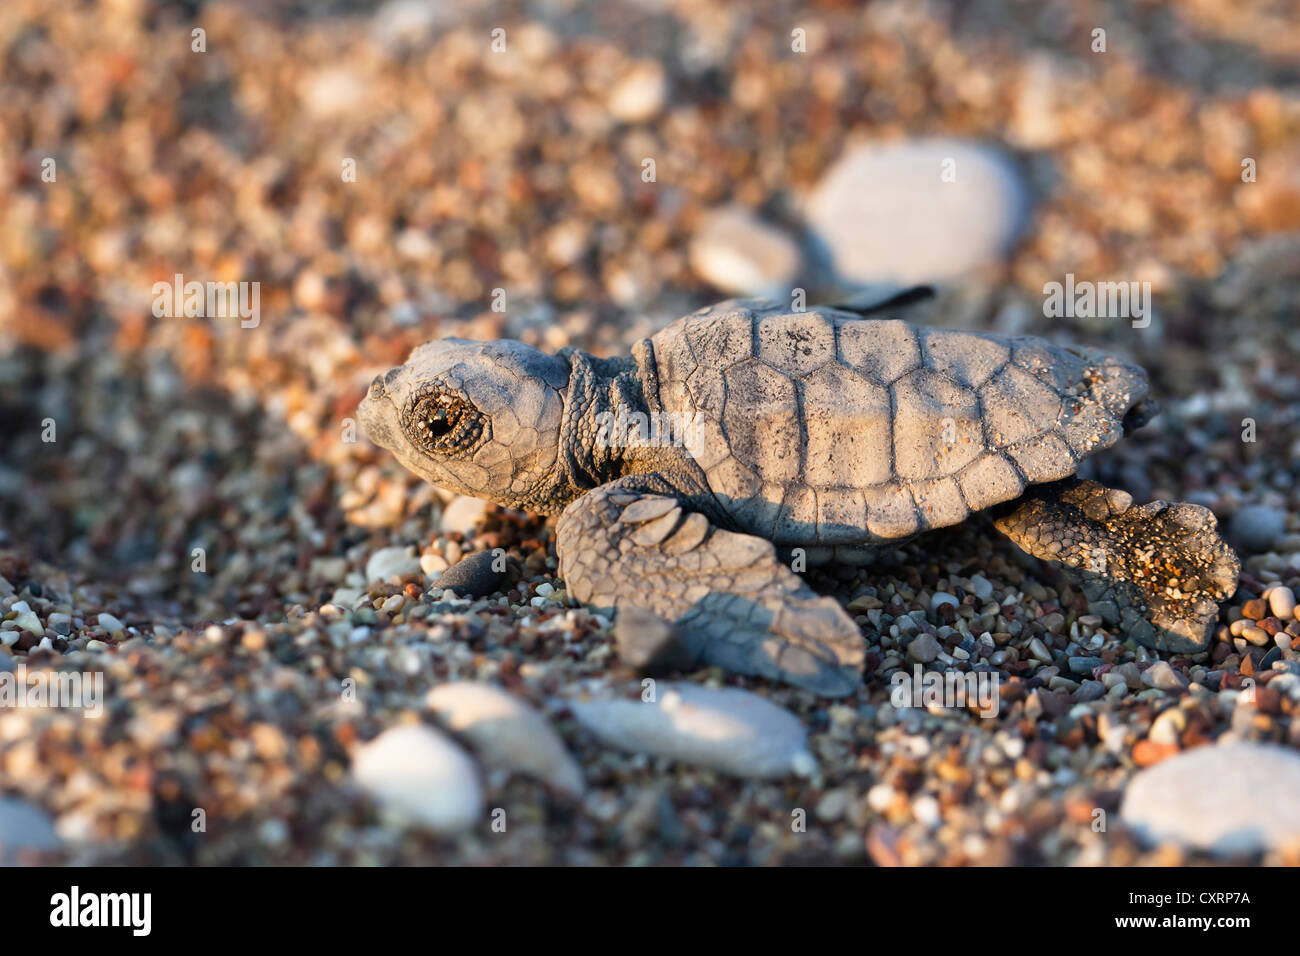 Loggerhead Sea Turtle (Caretta caretta), hatchling, Lycian Coast, Turkey, Mediterranean, Asia Minor - Stock Image